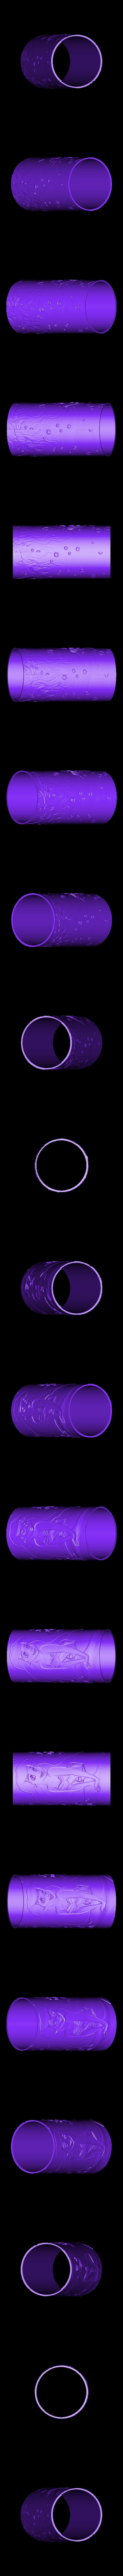 sirenita.stl Download free STL file The little mermaid • 3D printing model, 3dlito